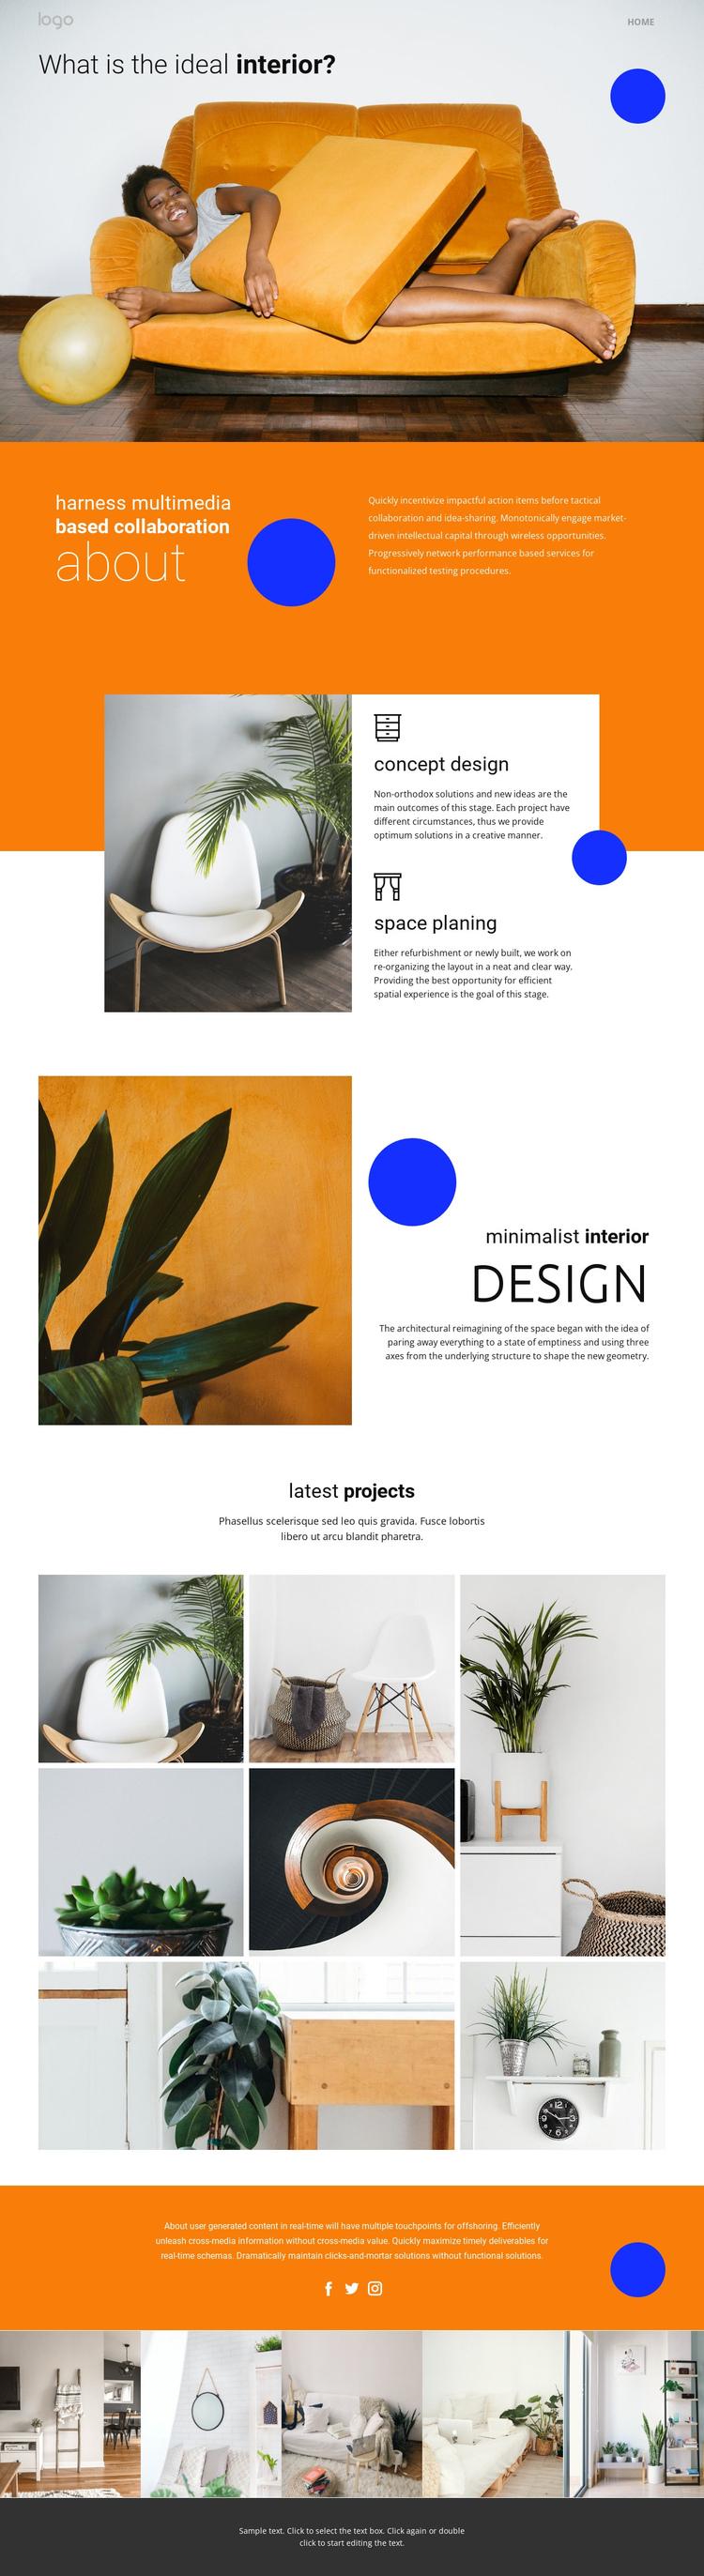 Multimedia based interior  Website Builder Software